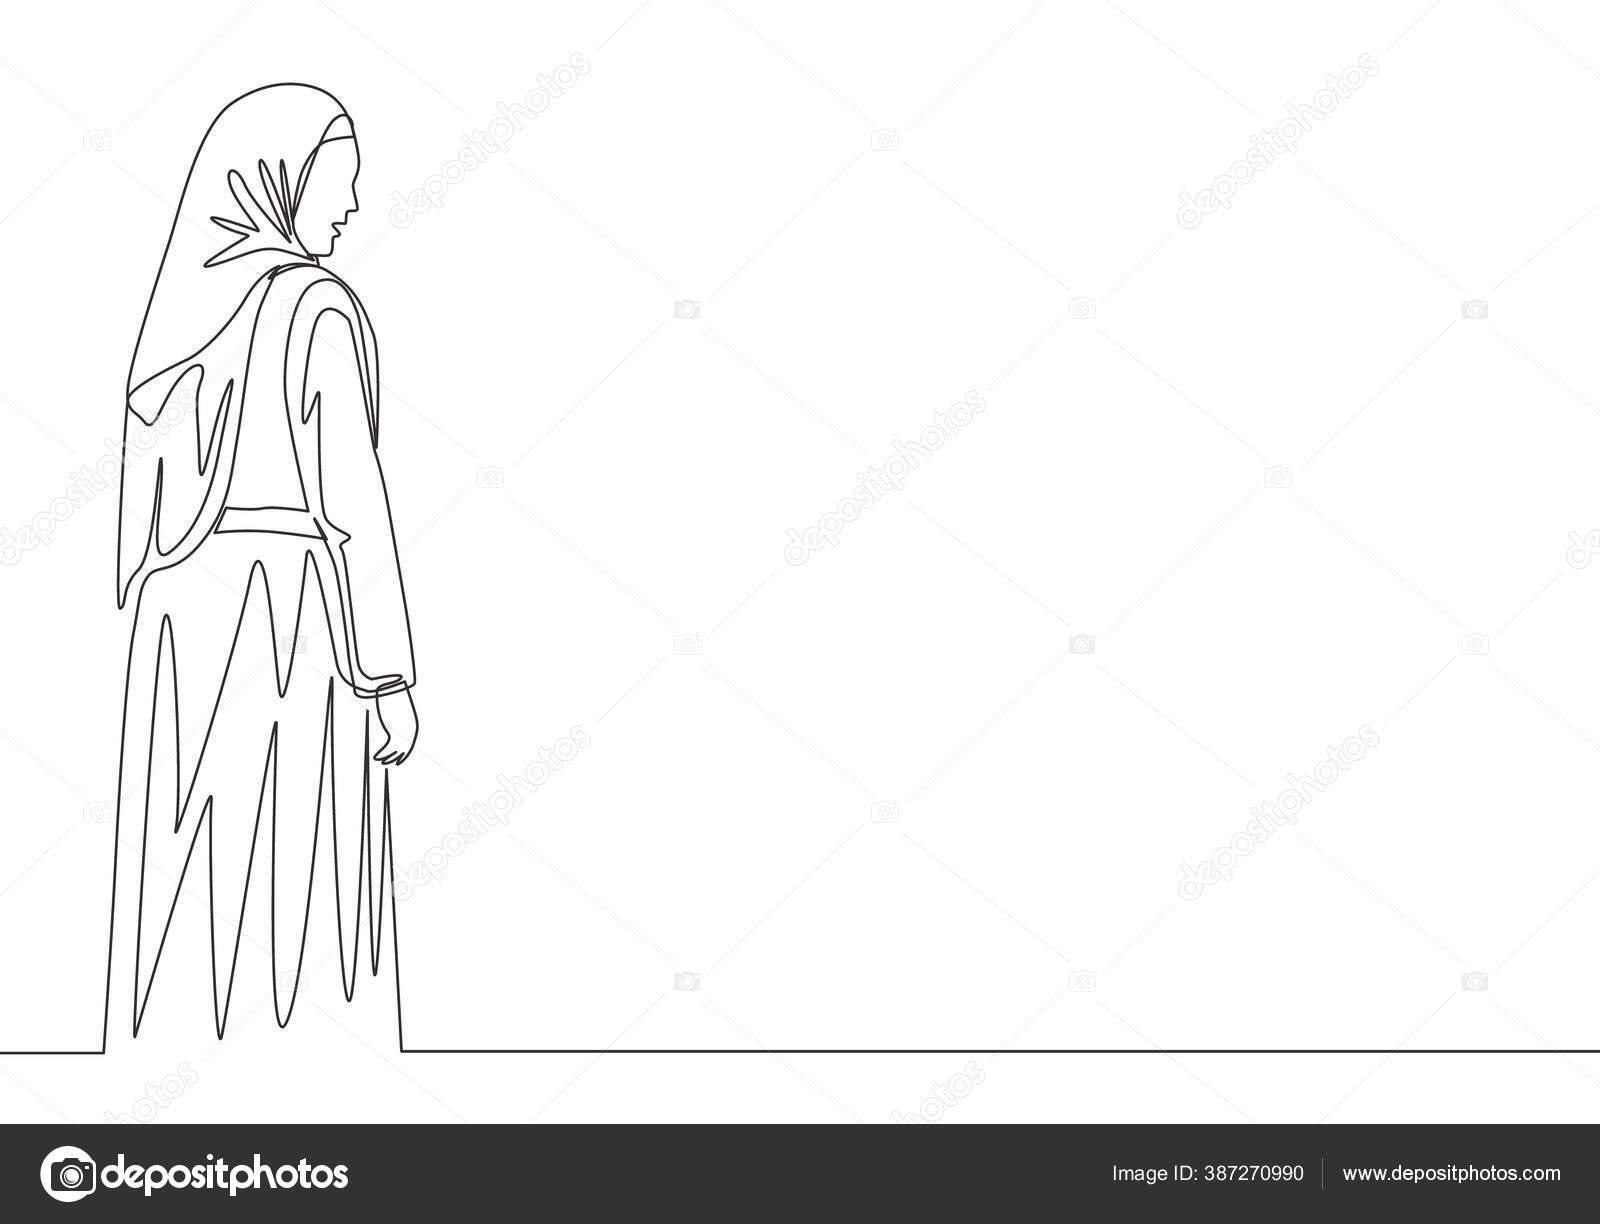 Garis Tunggal Terus Menerus Gambar Muda Bahagia Muslim Gadis